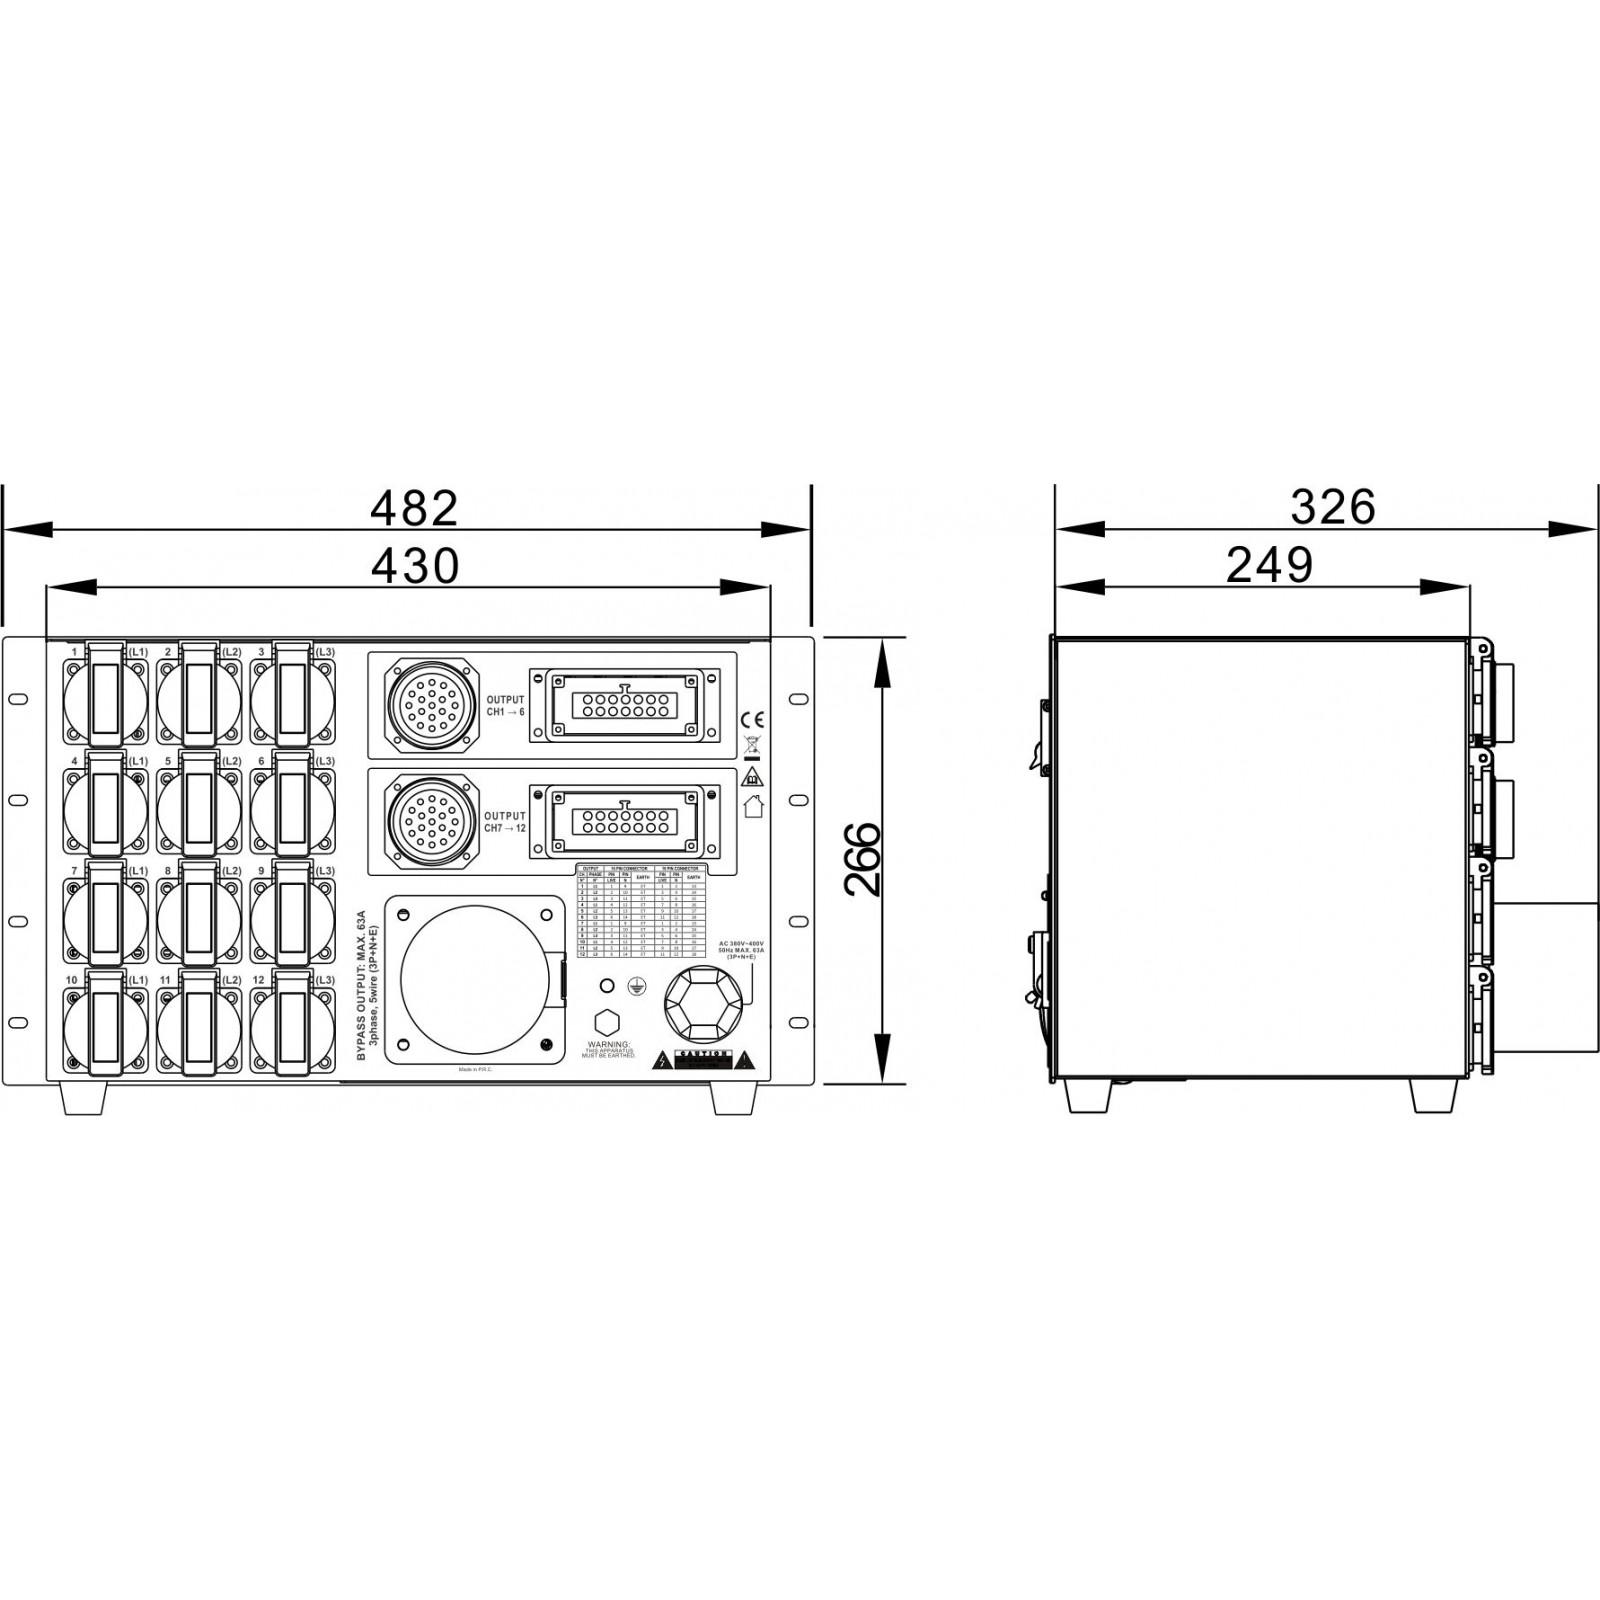 German 220 Outlet Wiring Diagram 3 Wire Dryer Plug 240 Volt Range Briteq Pd 63sh On